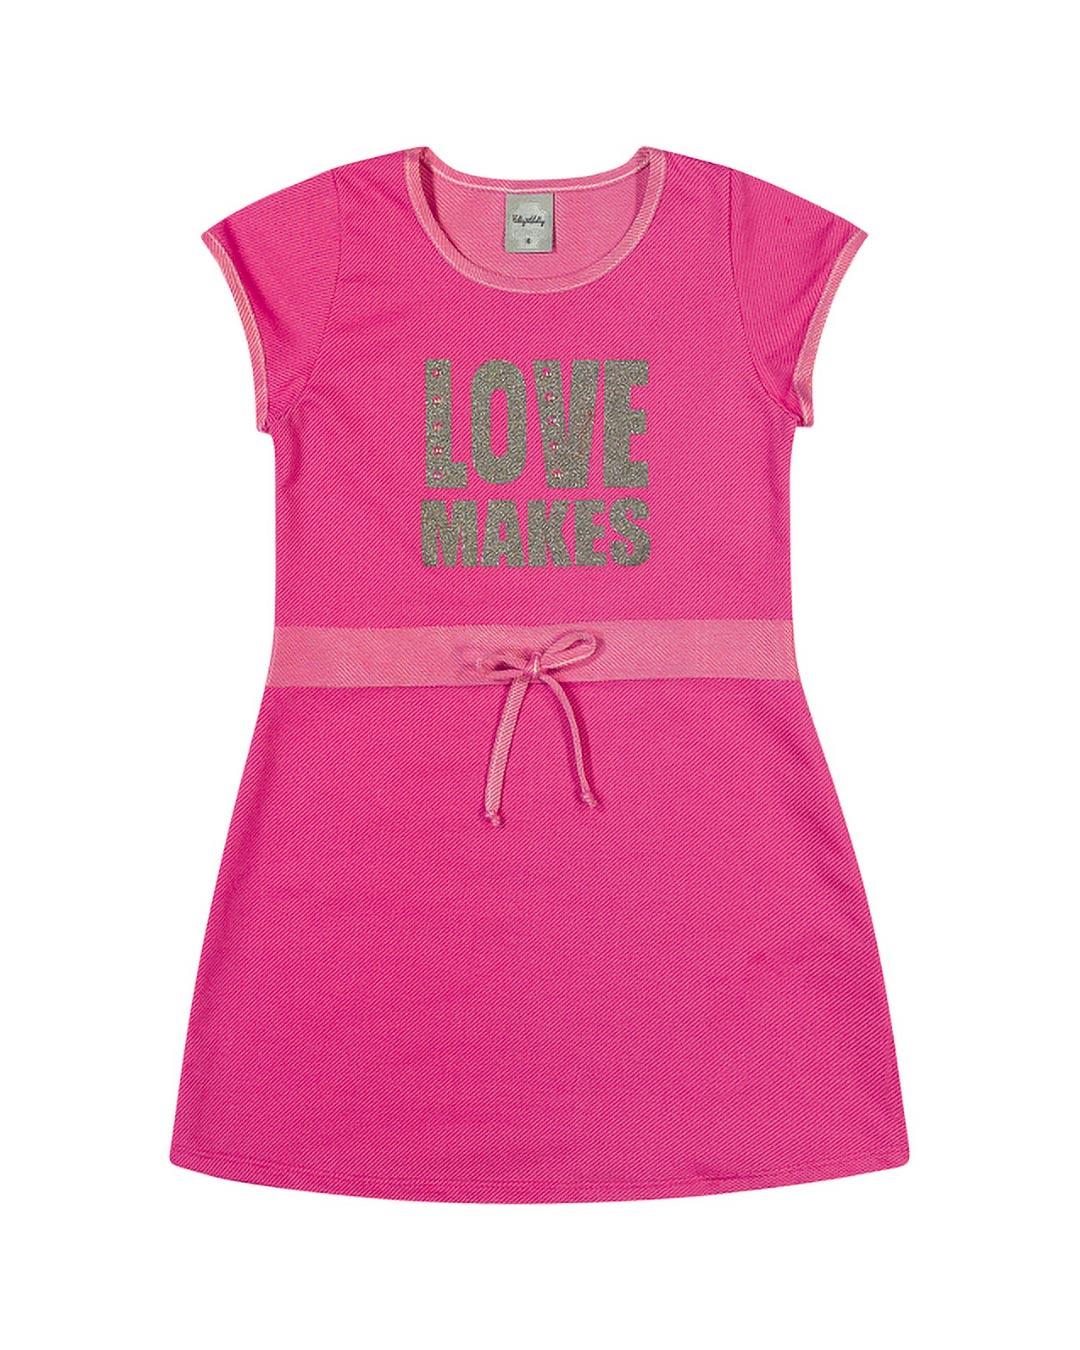 Vestido Infantil Love Makes - Kely & Kety